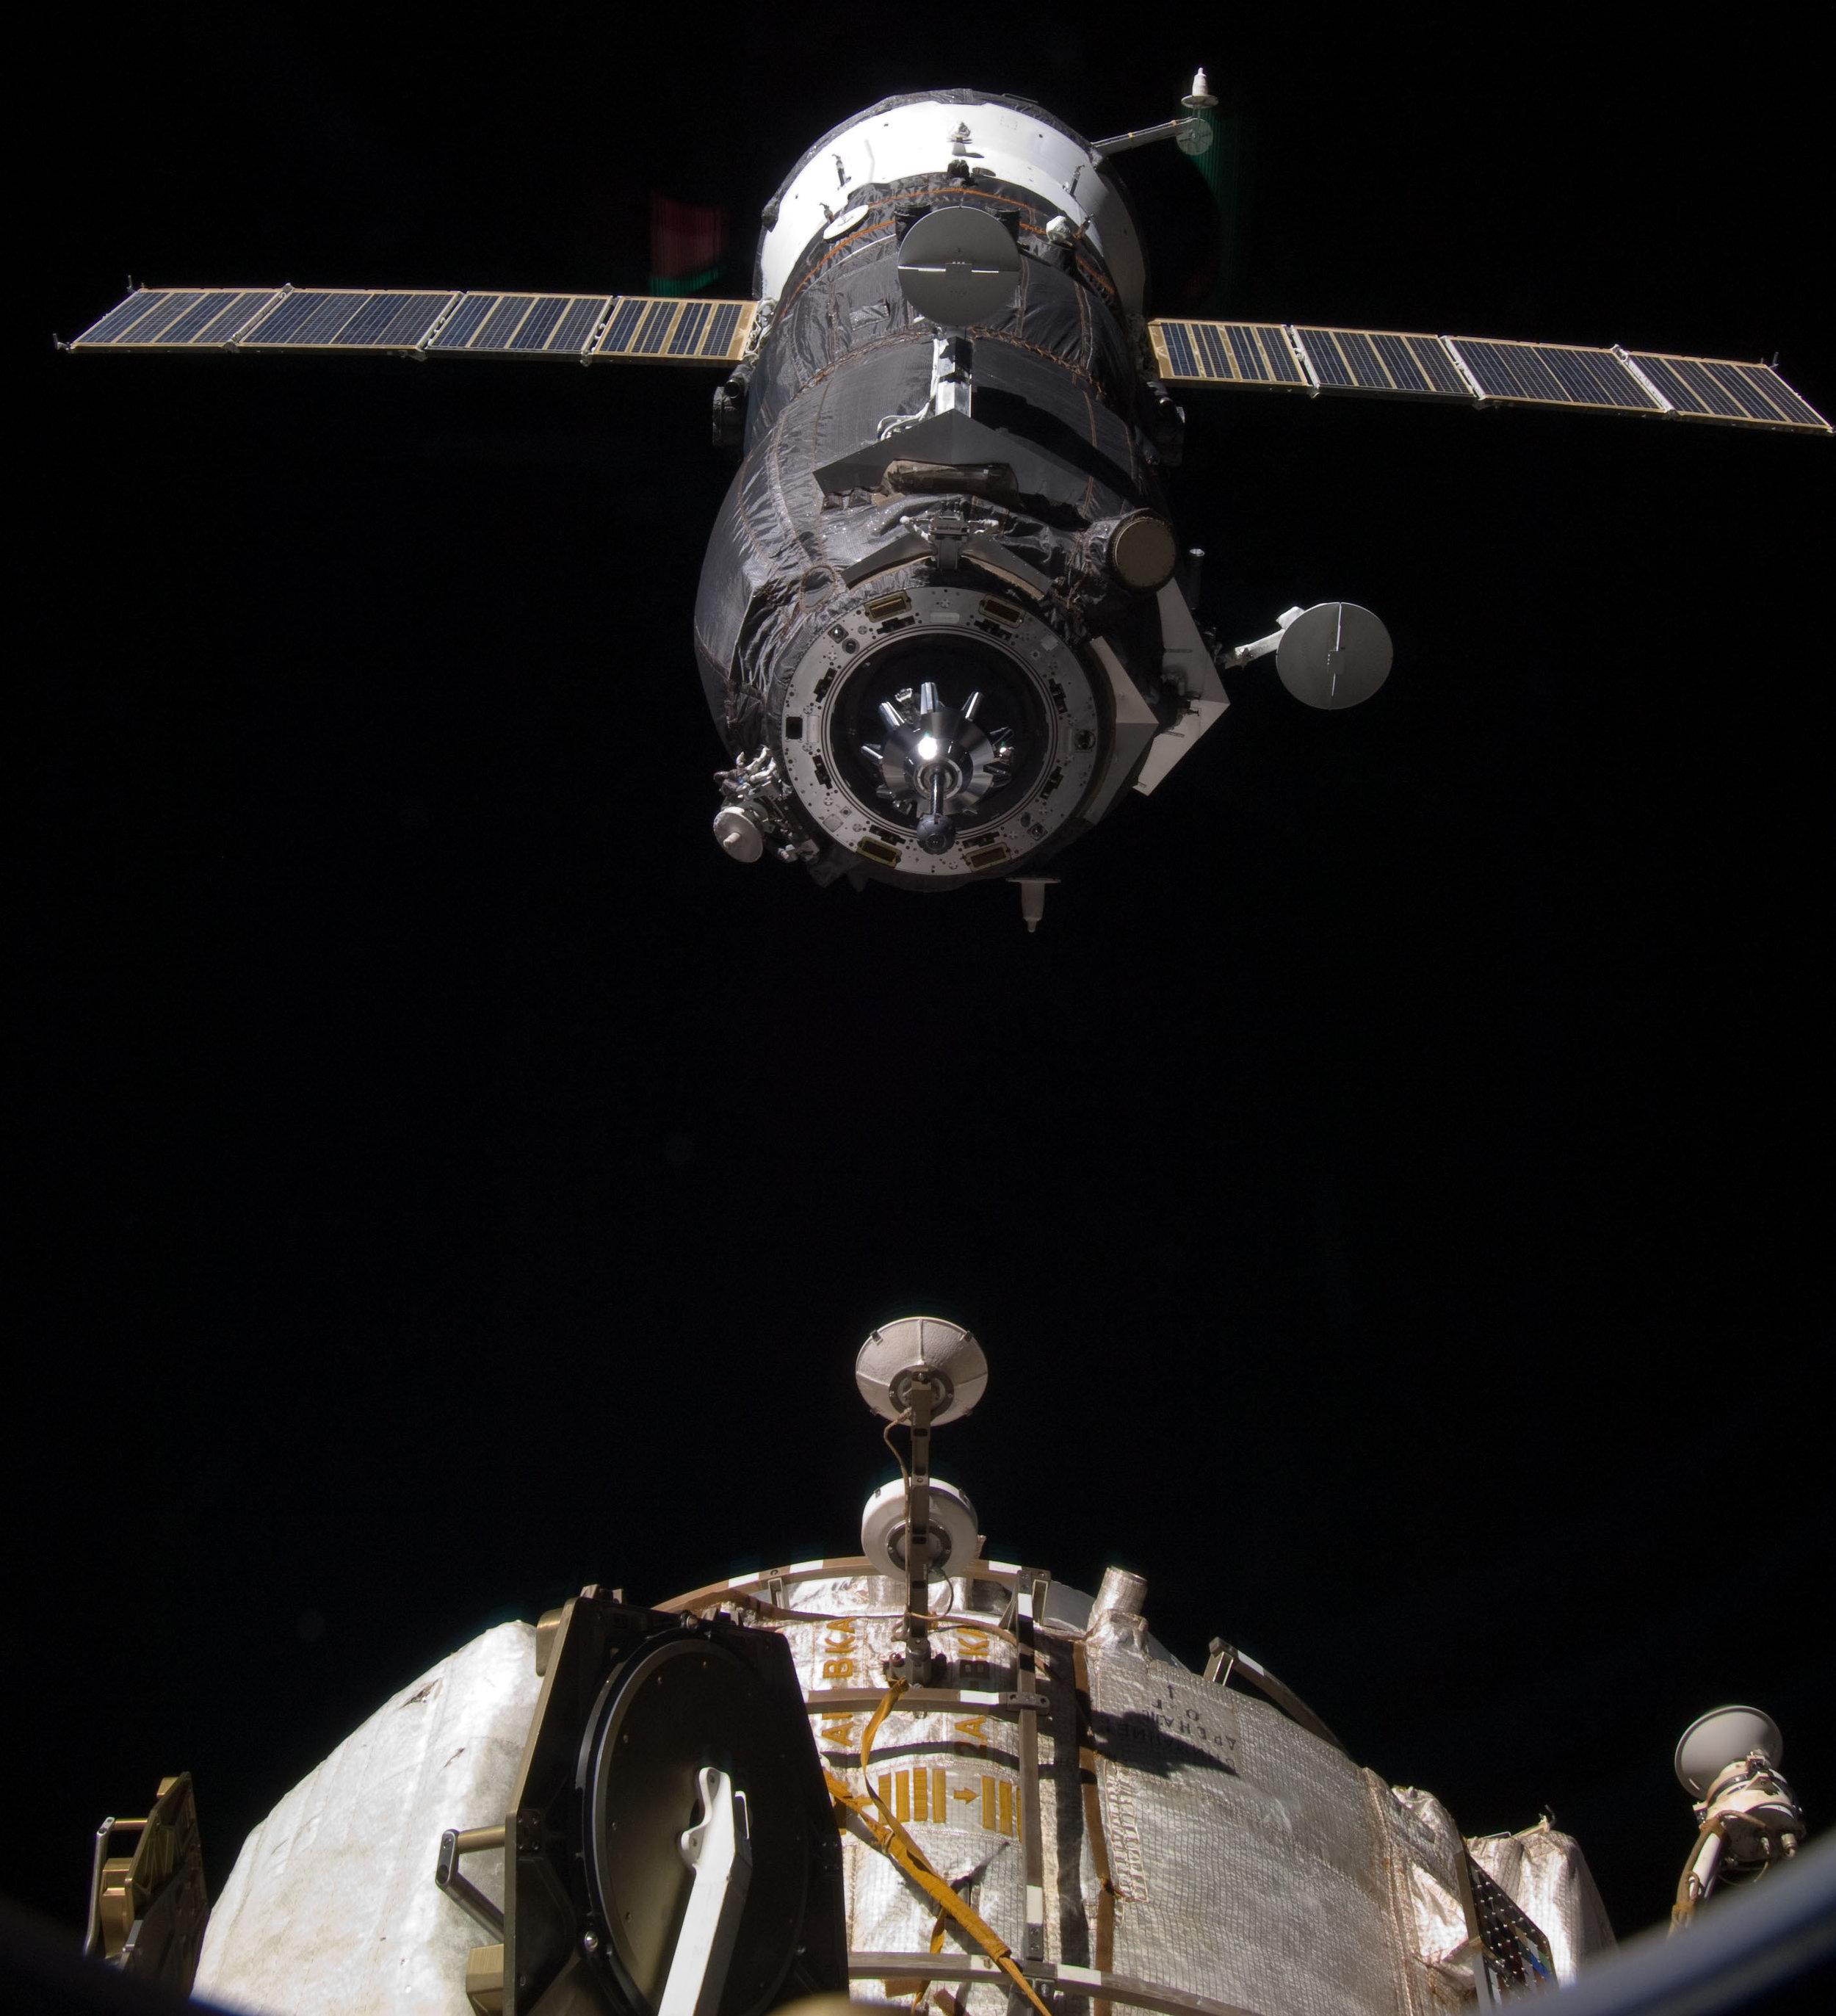 Progress MS-13M using the Kurs docking system